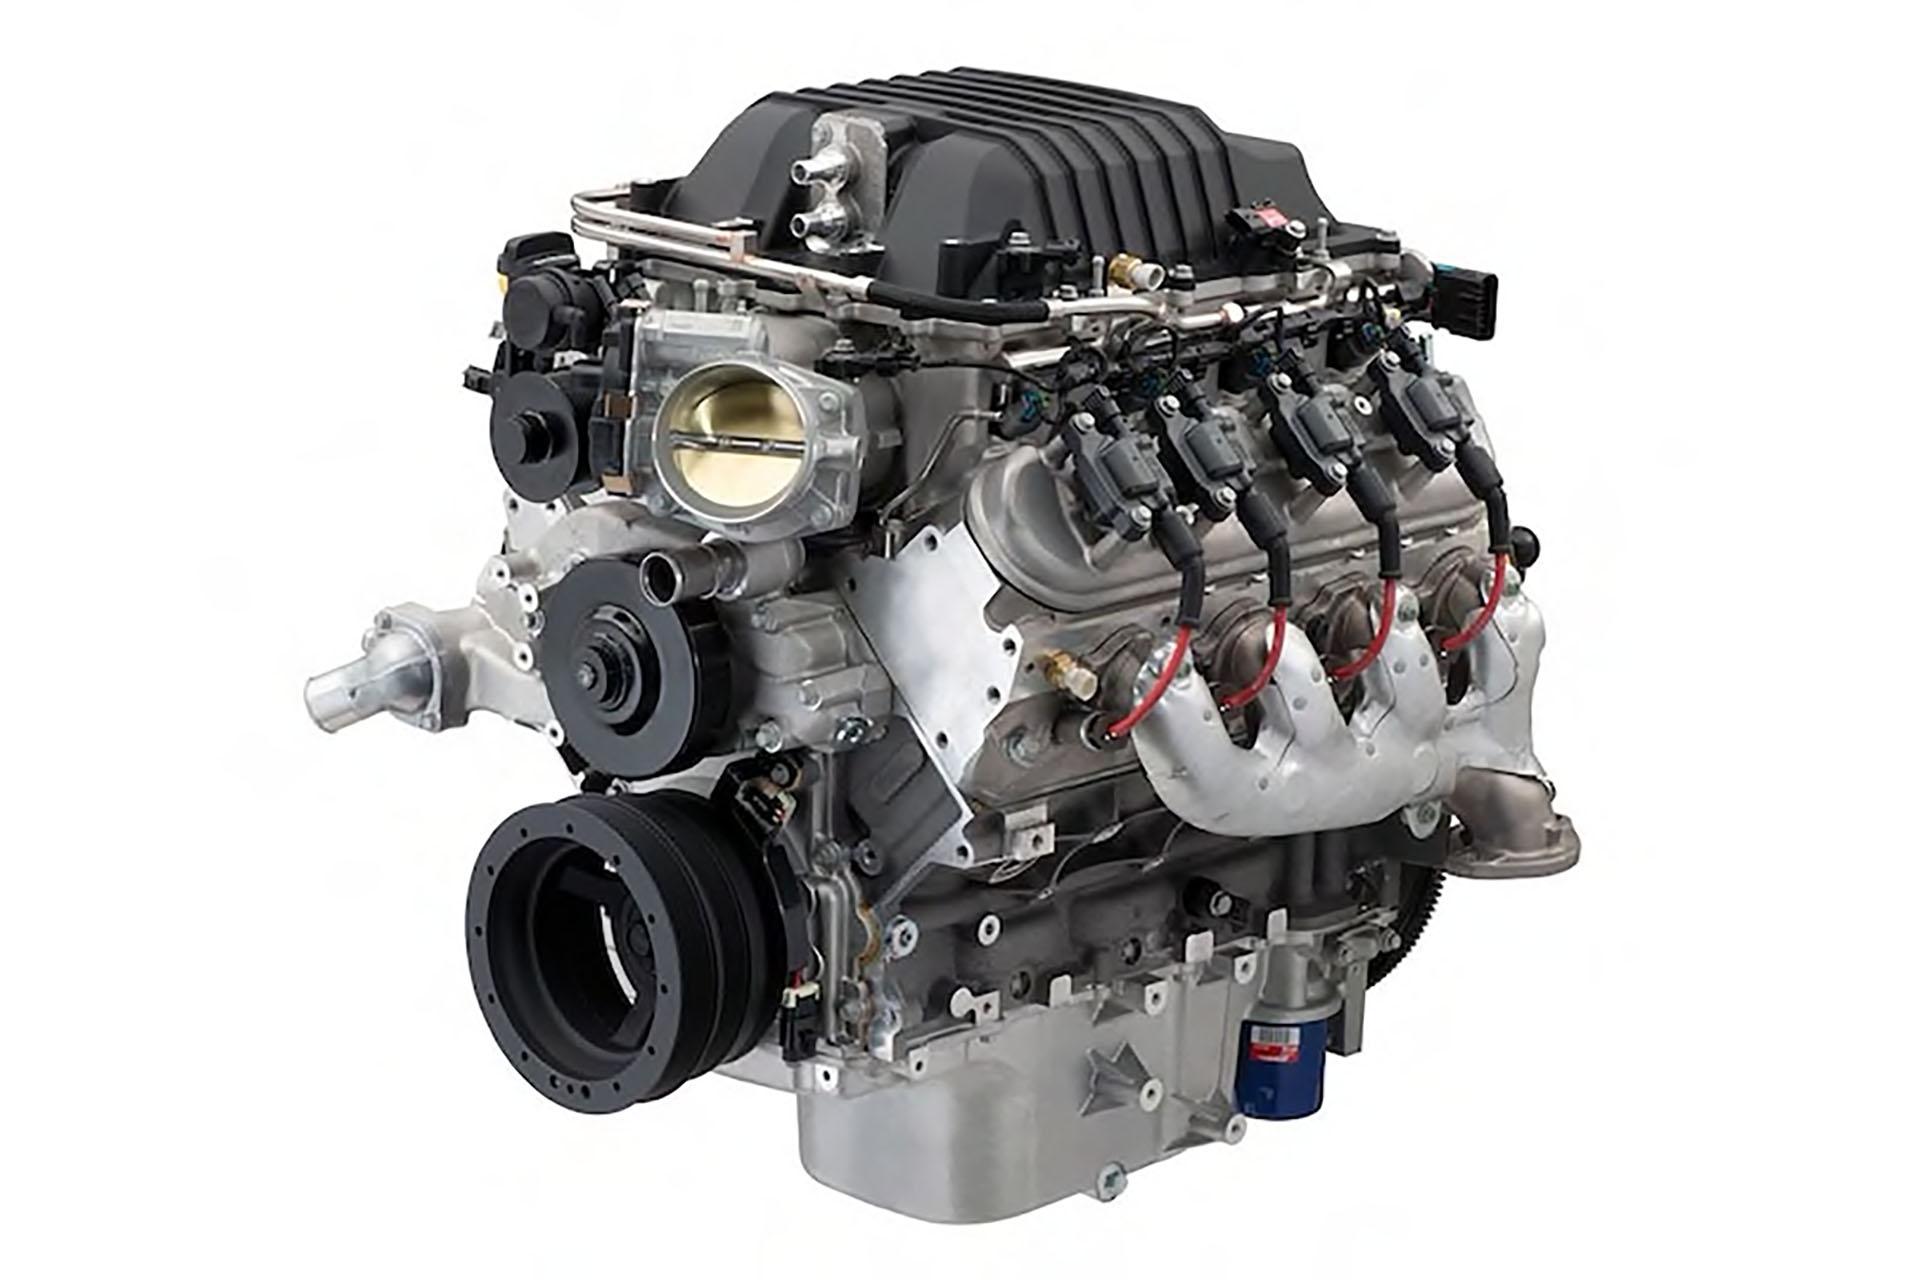 Chevy small block LSA engine